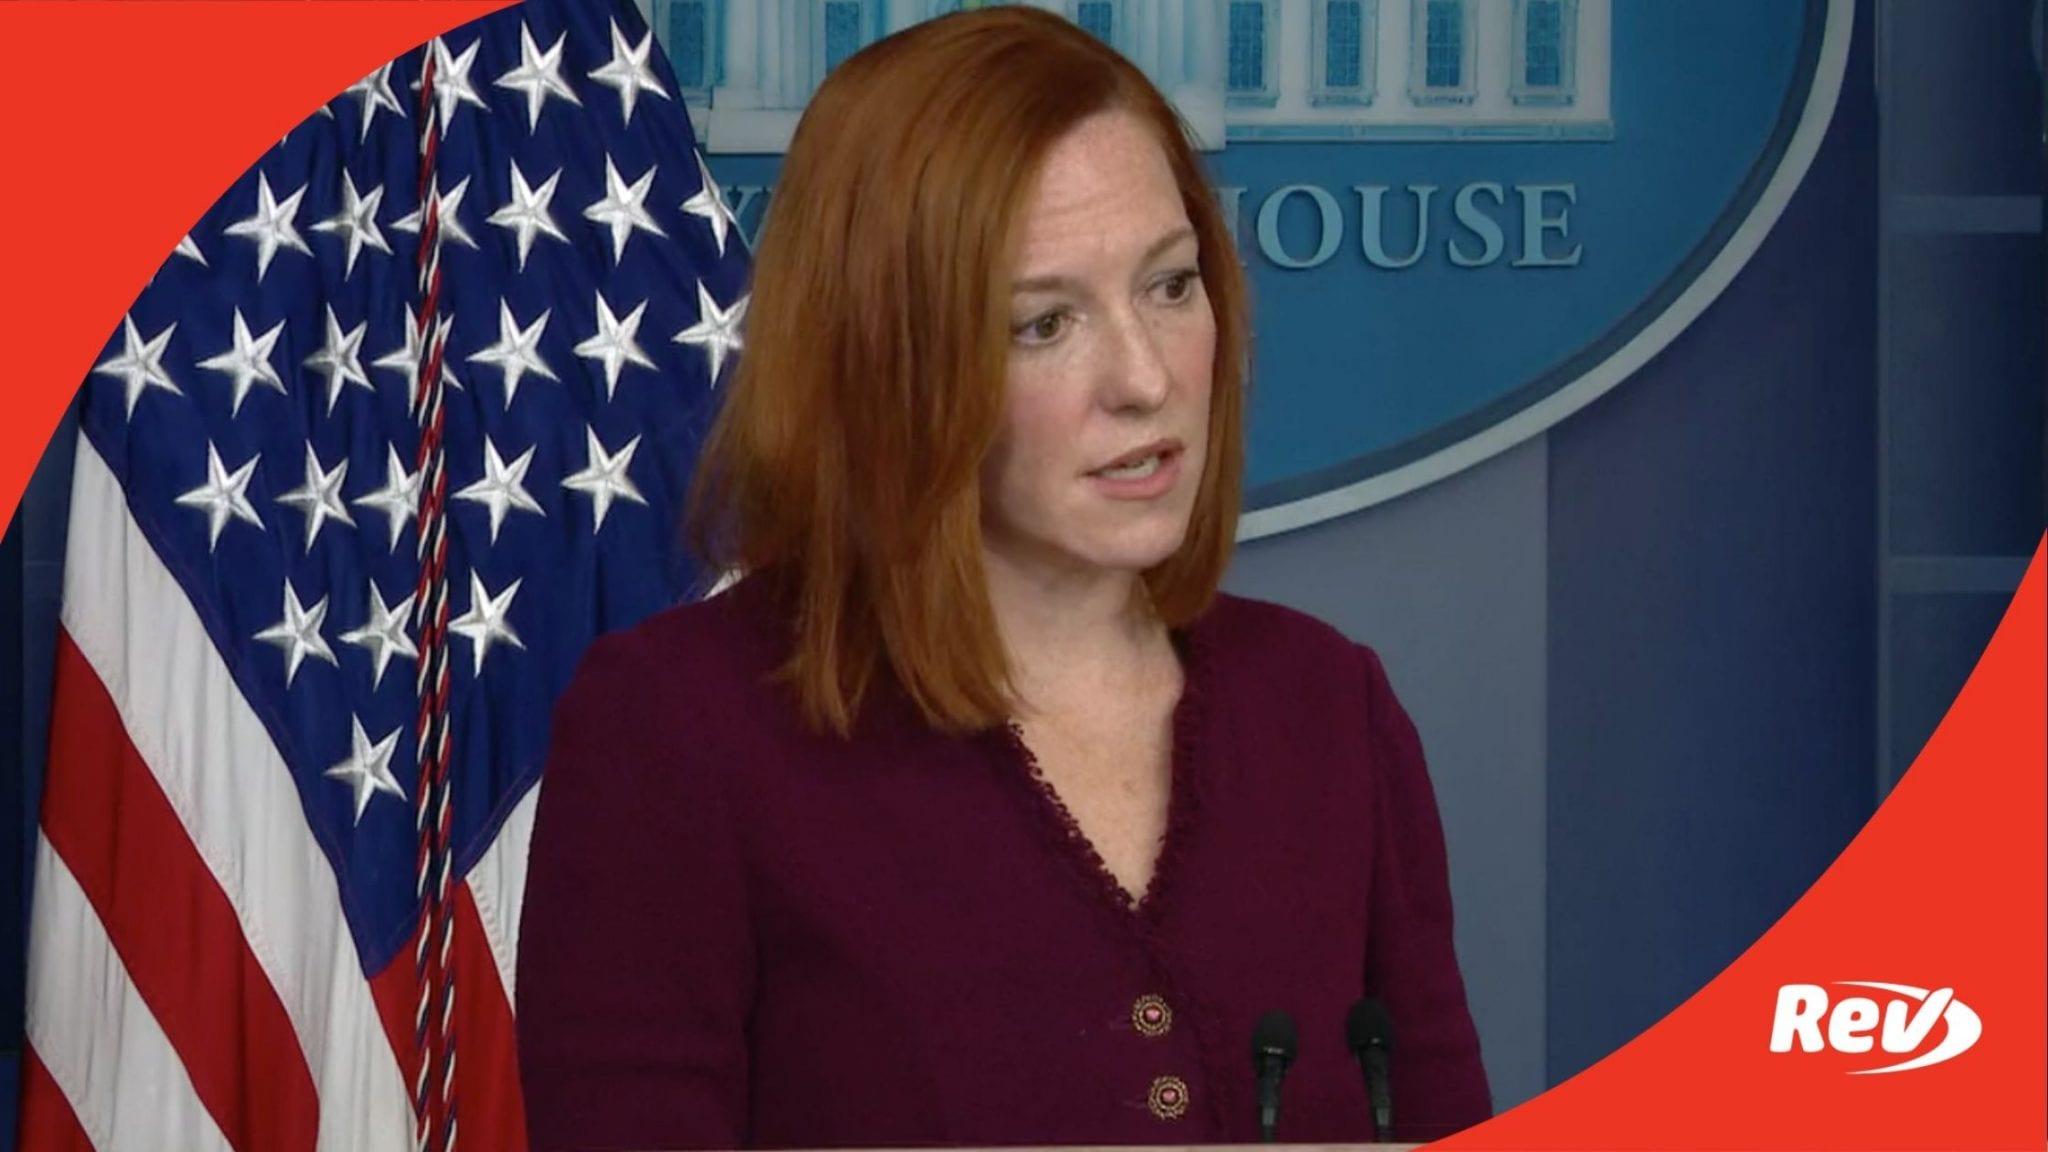 Press Secretary Jen Psaki White House Press Conference Transcript February 9